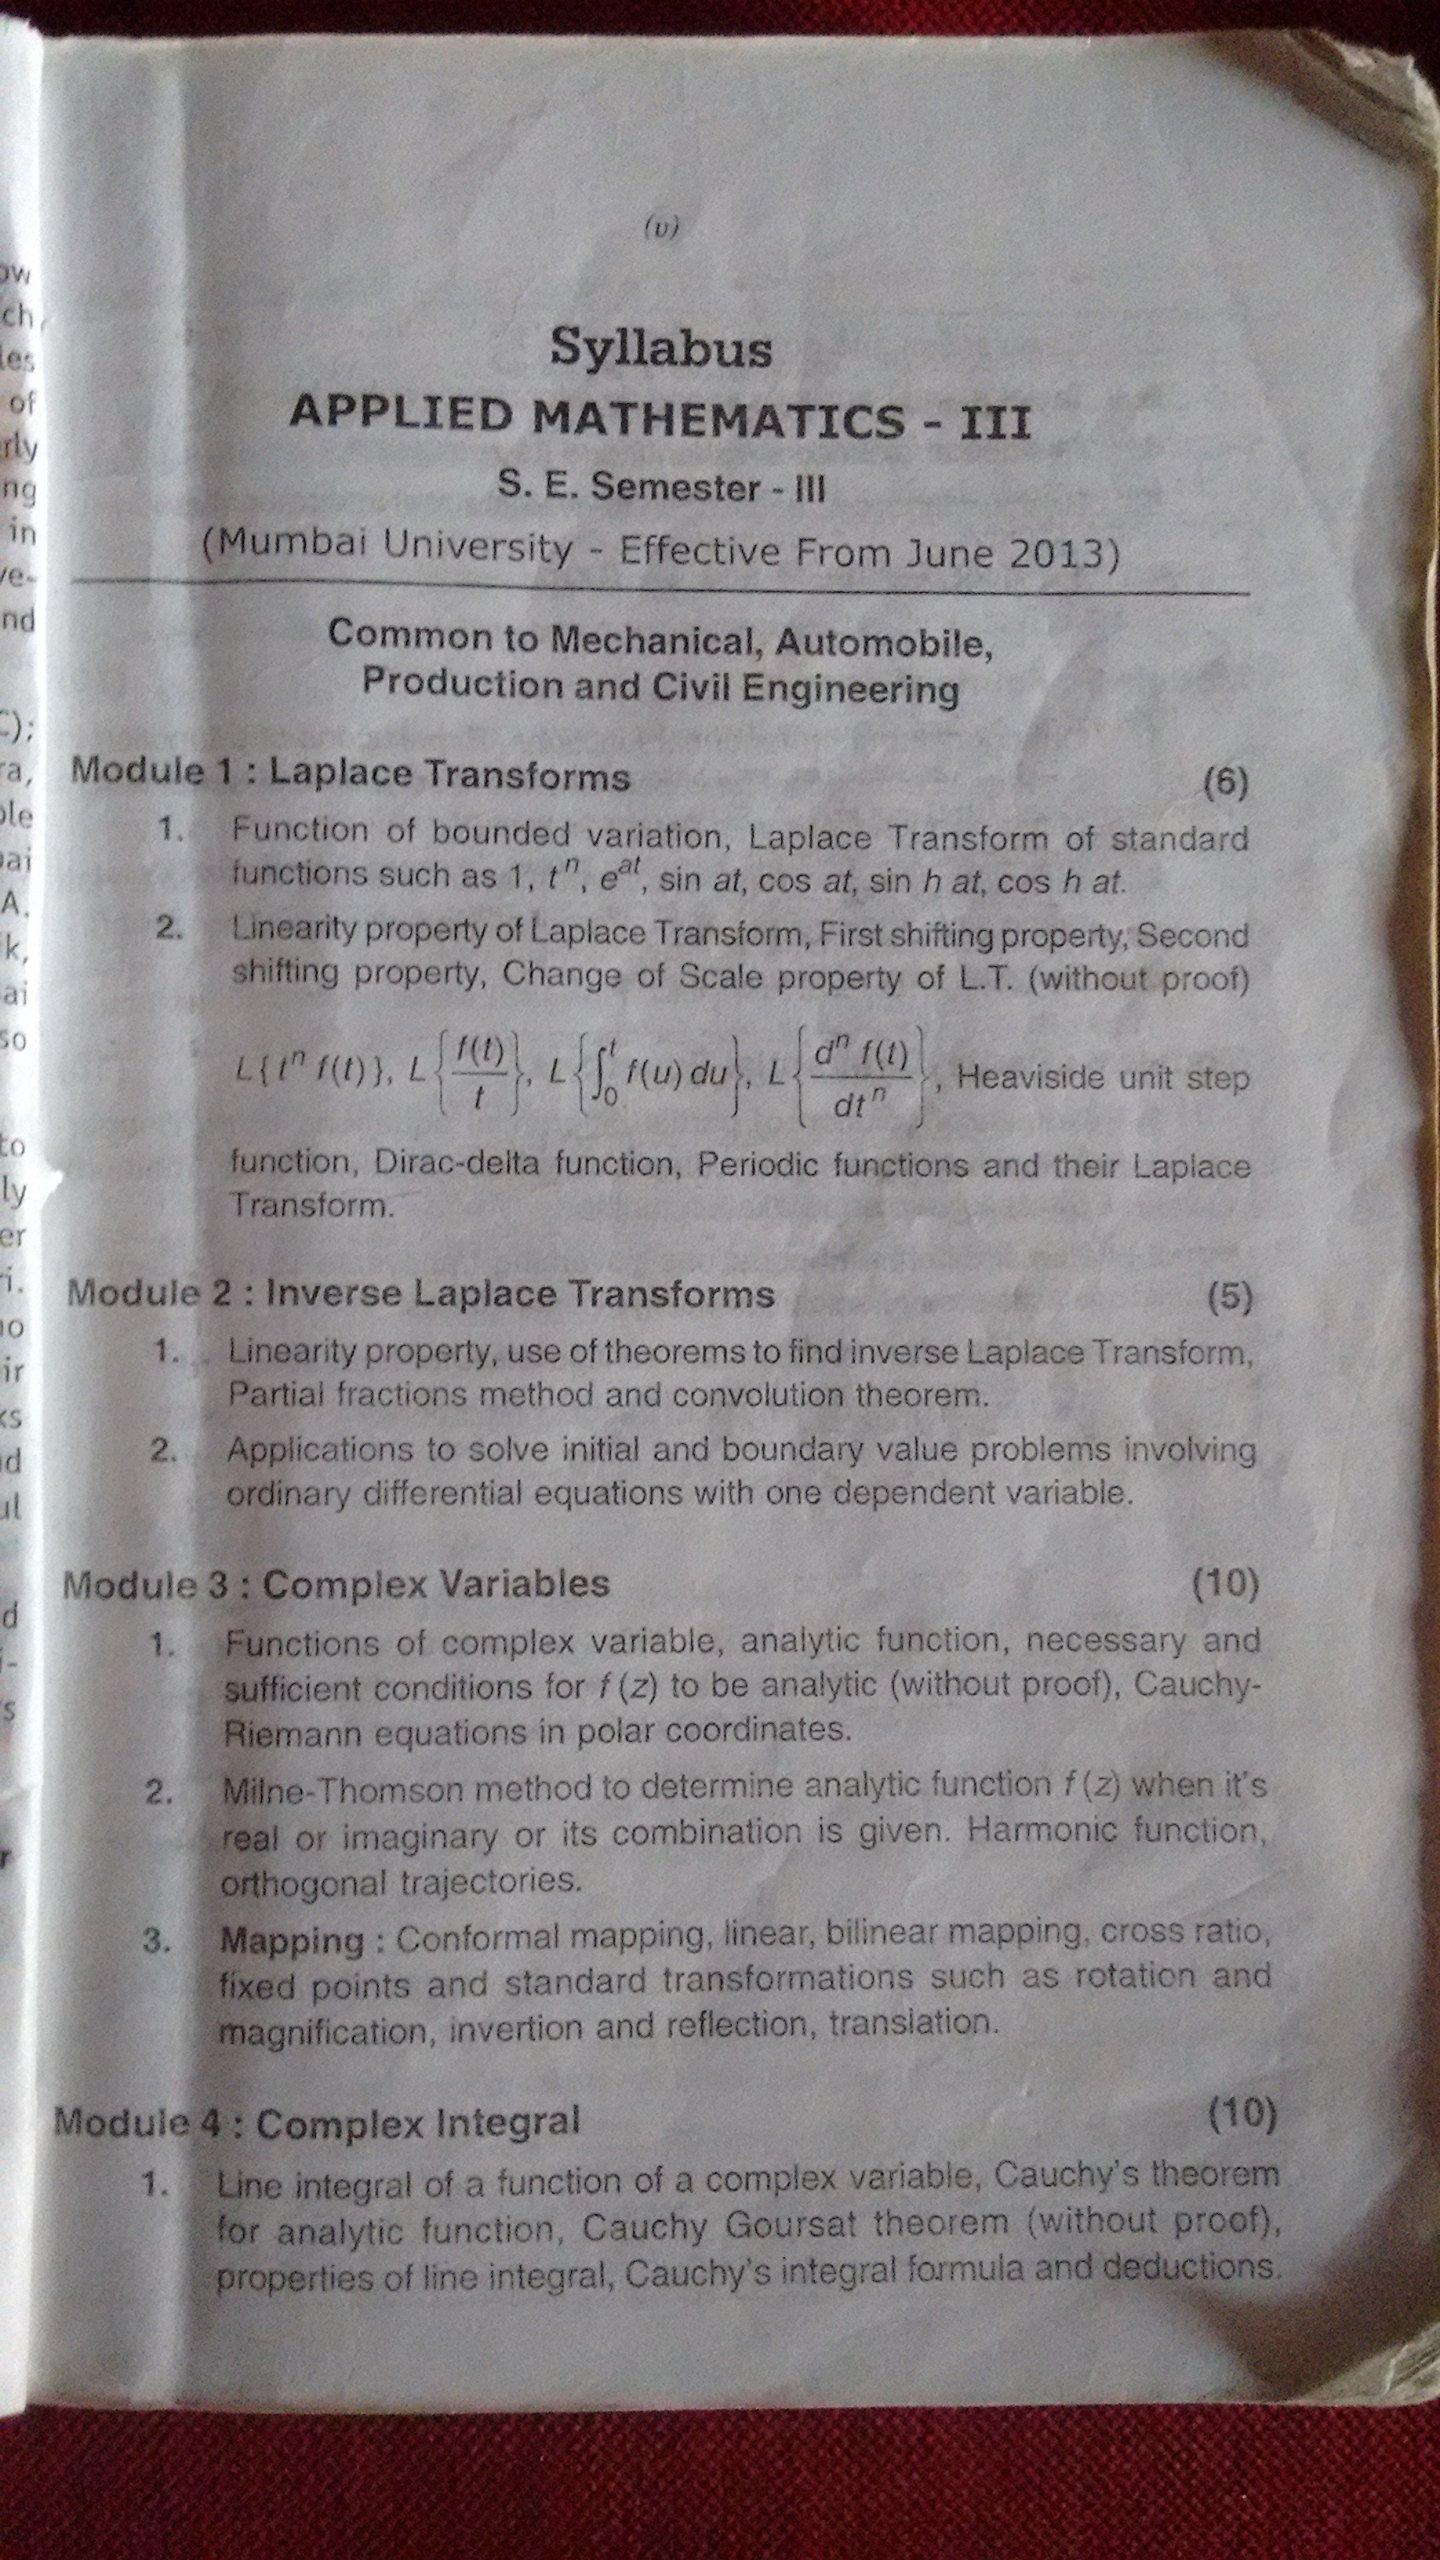 Applied mathematics 1 by g v kumbhojkar pdf editor